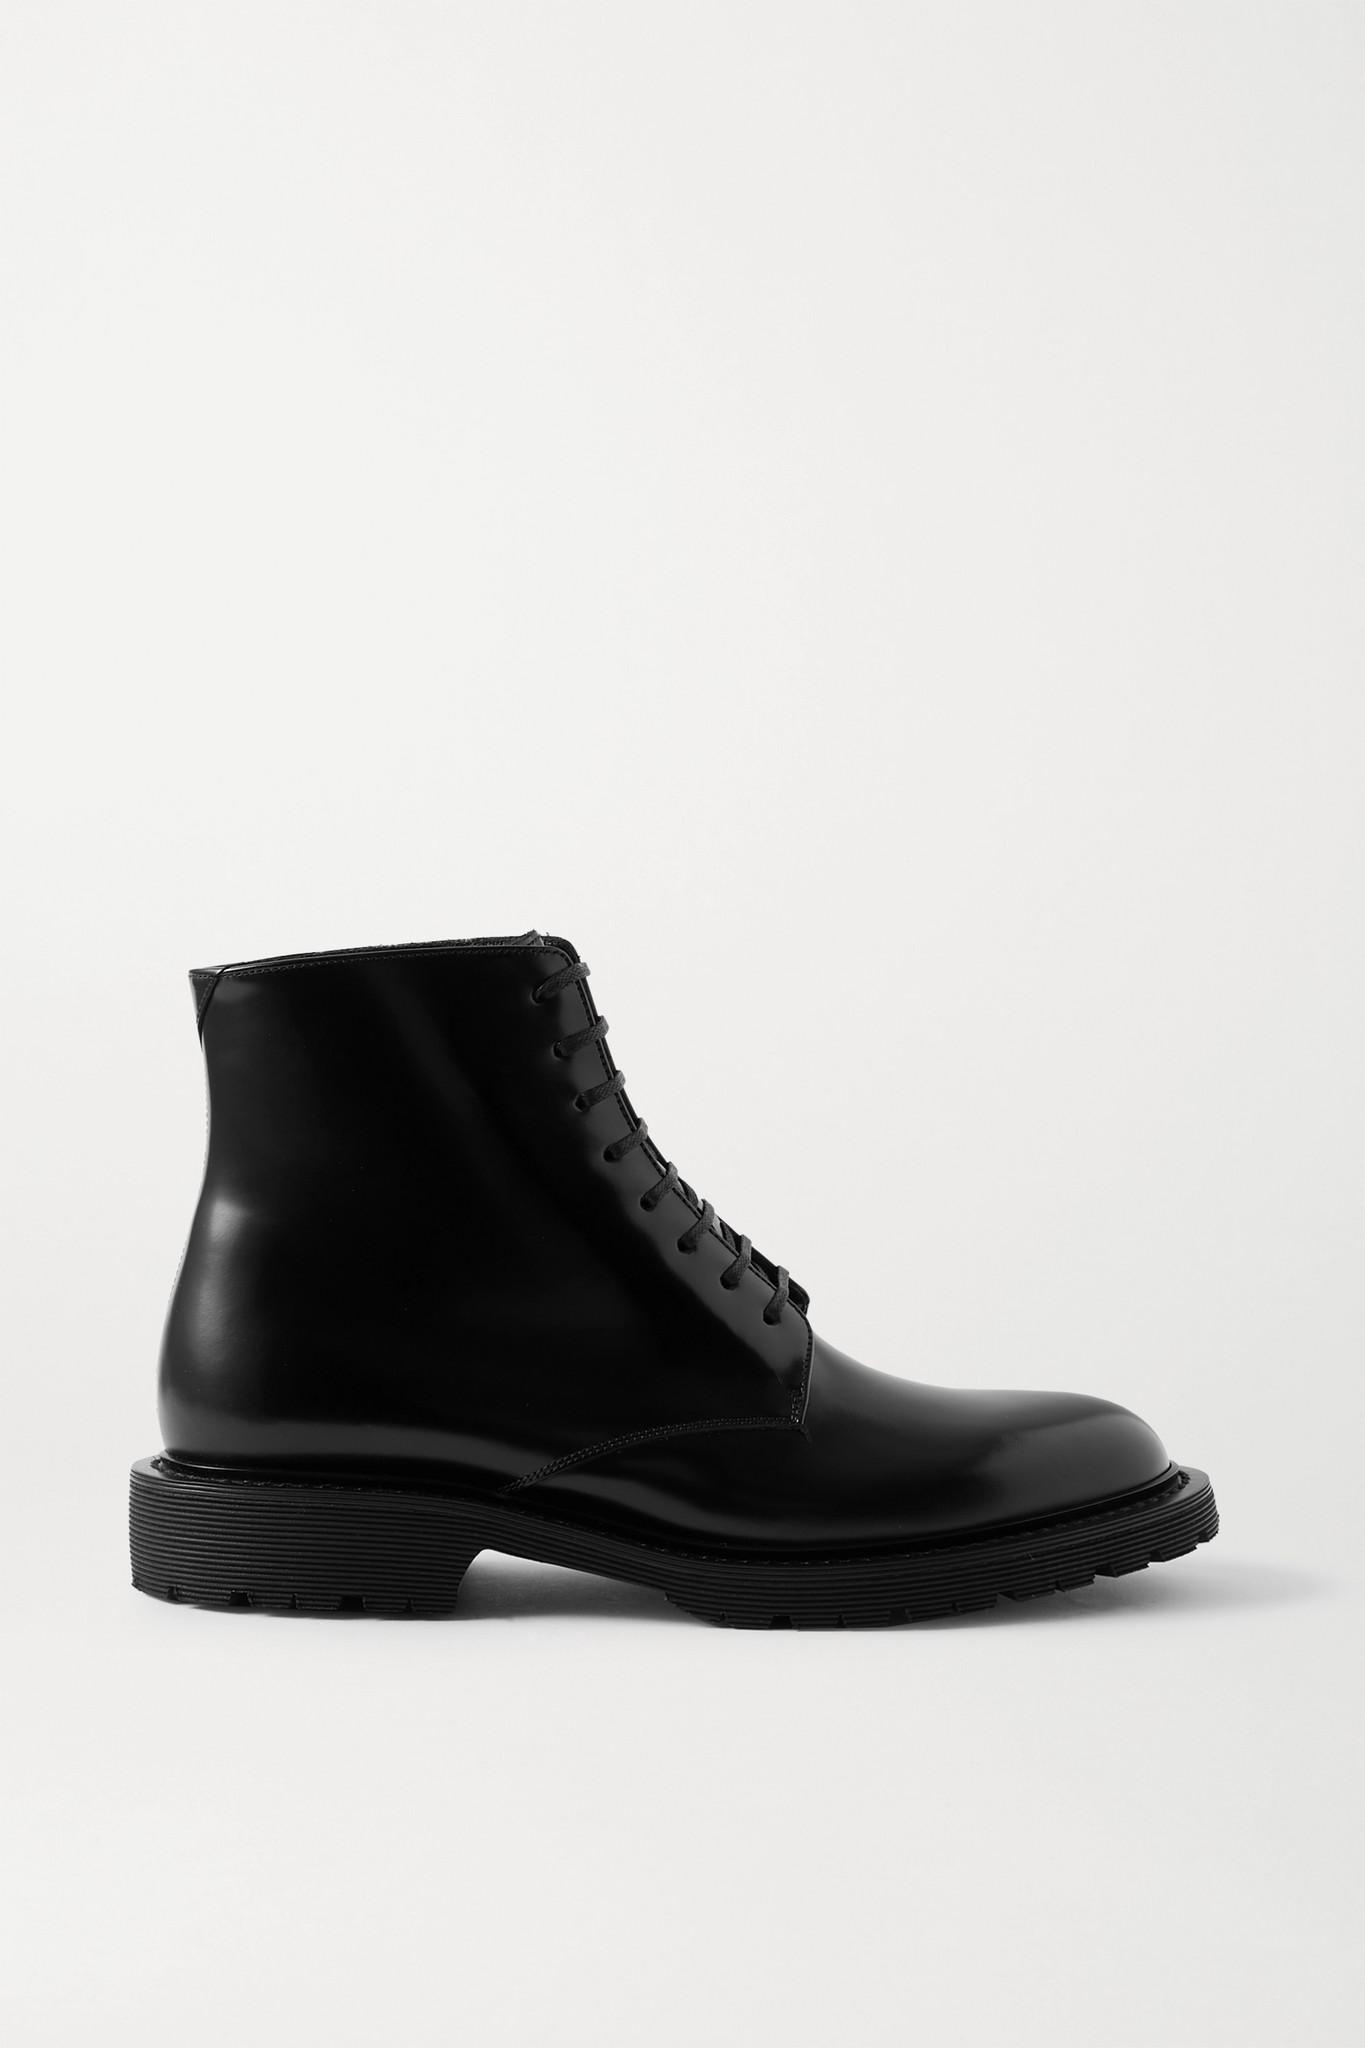 SAINT LAURENT - Army 皮革踝靴 - 黑色 - IT39.5